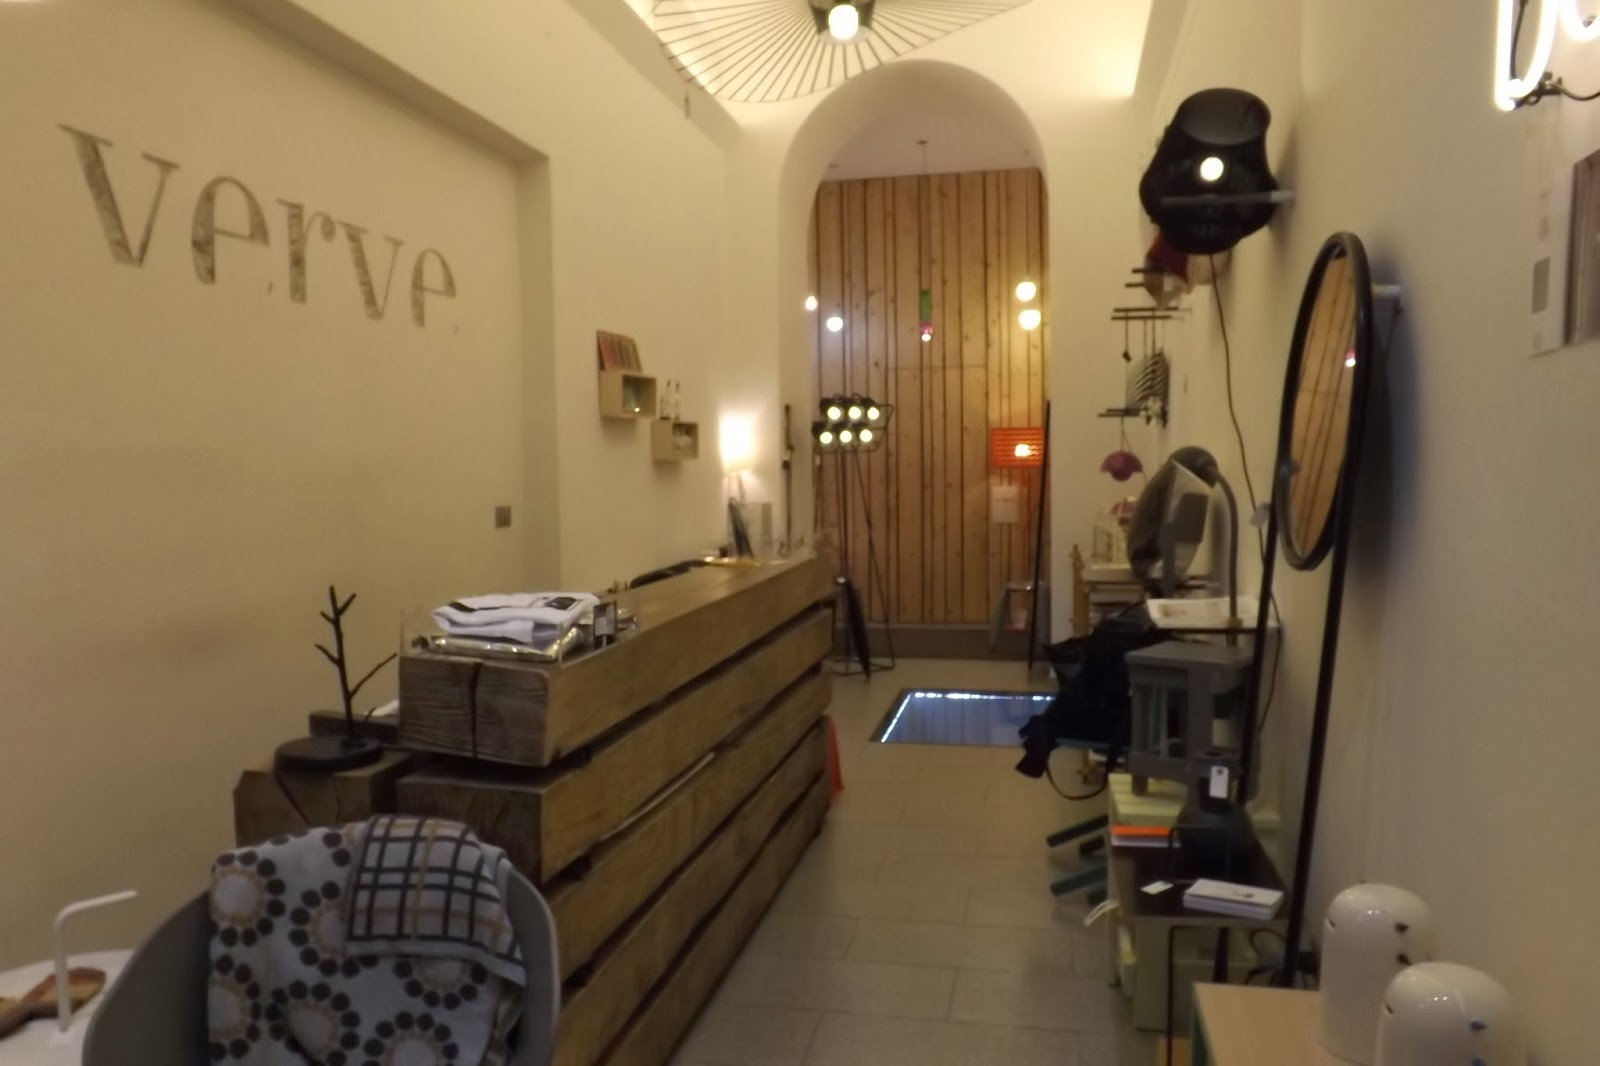 Negozi arredamento torino design arredamento negozi for Negozi mobili